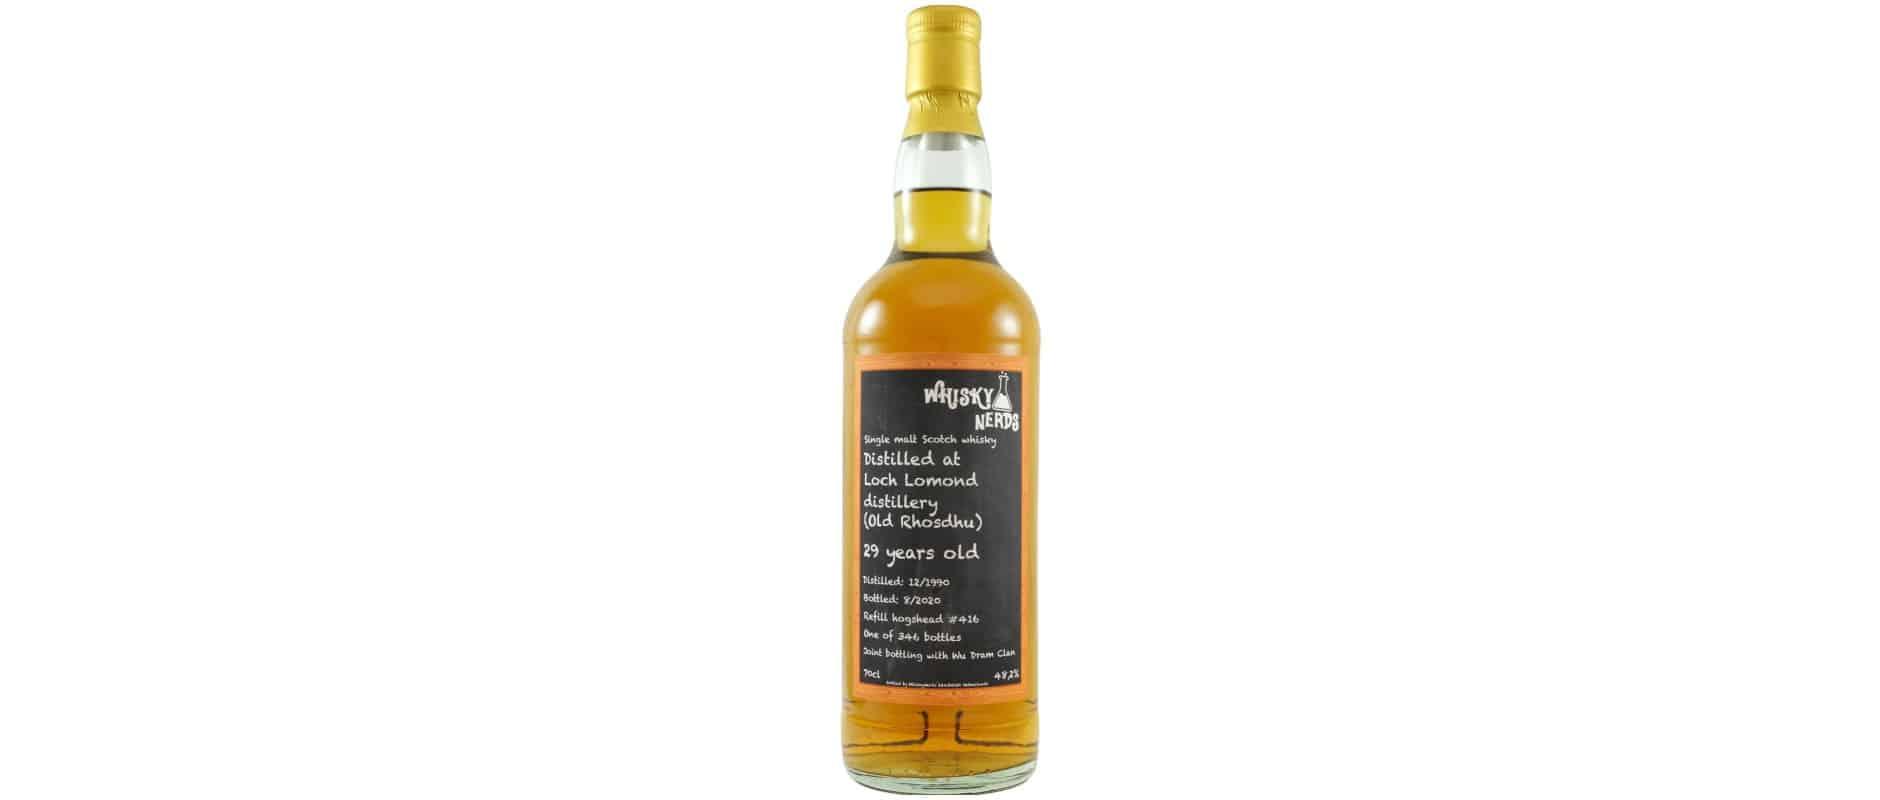 old rhosdhu loch lomond 1990 29yo whiskynerds